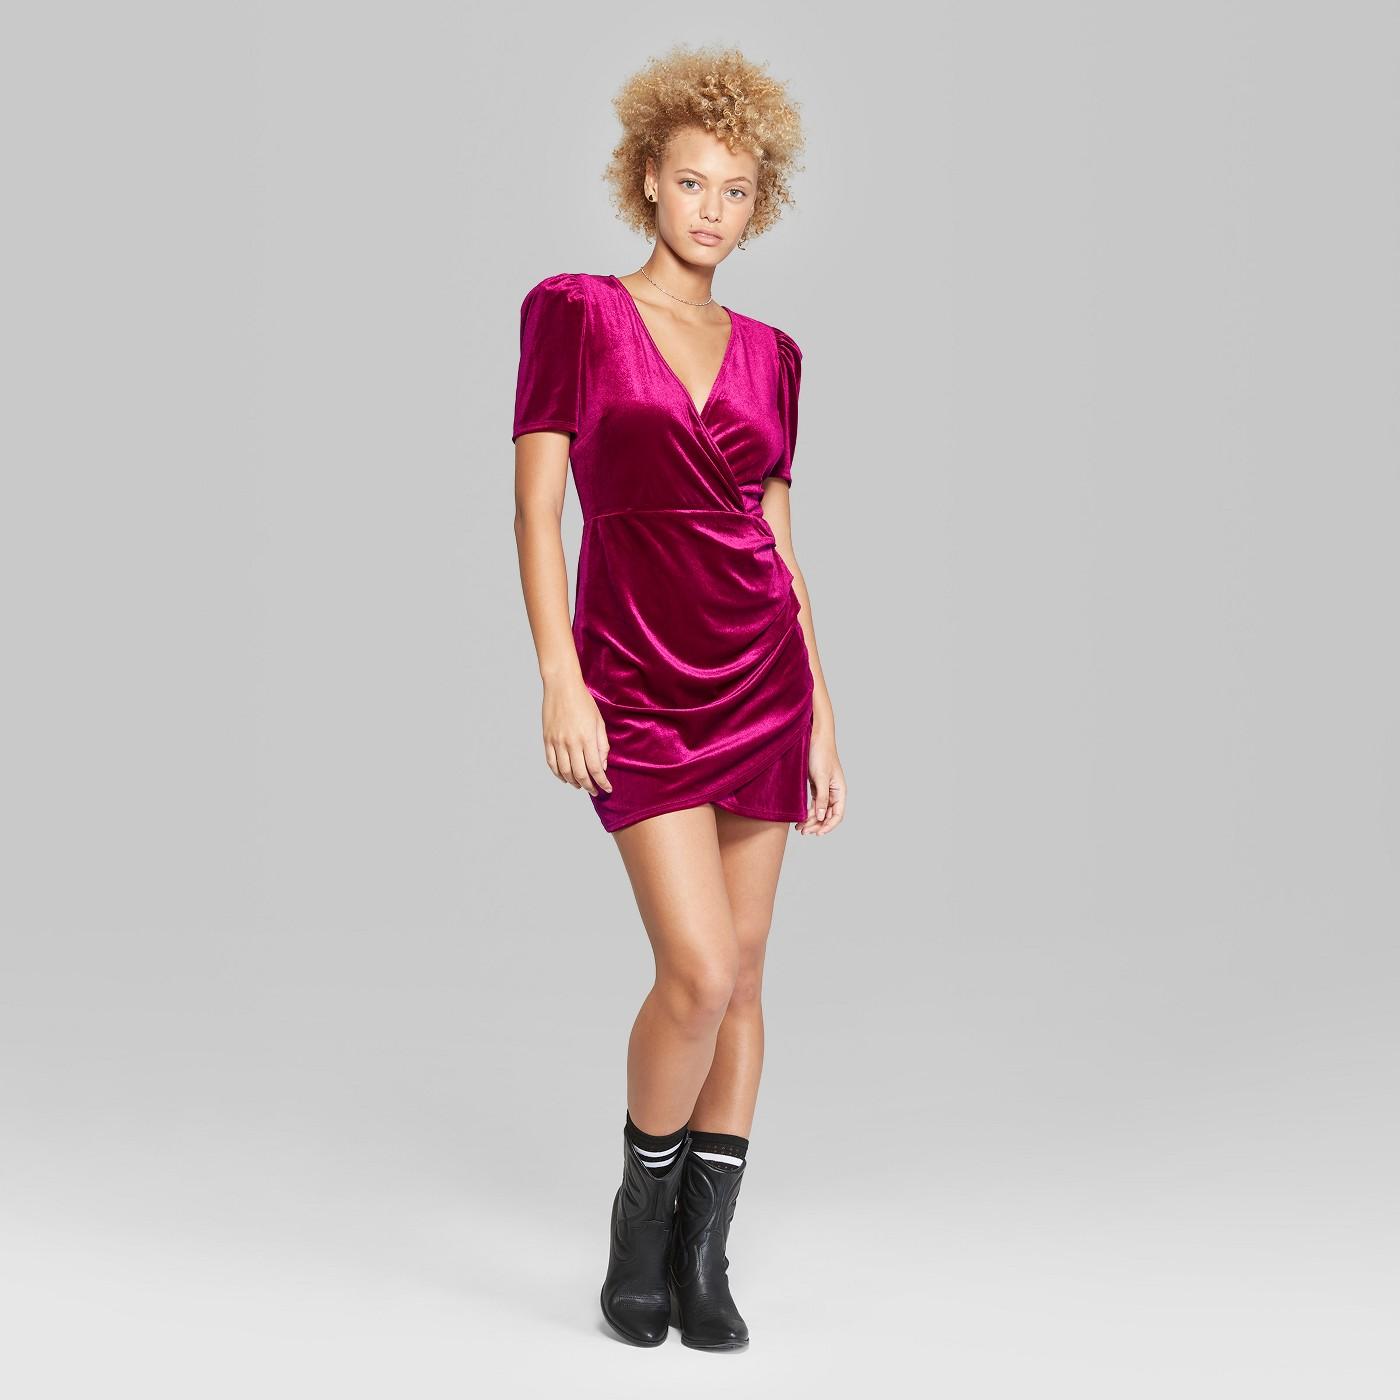 pink dress.jpg